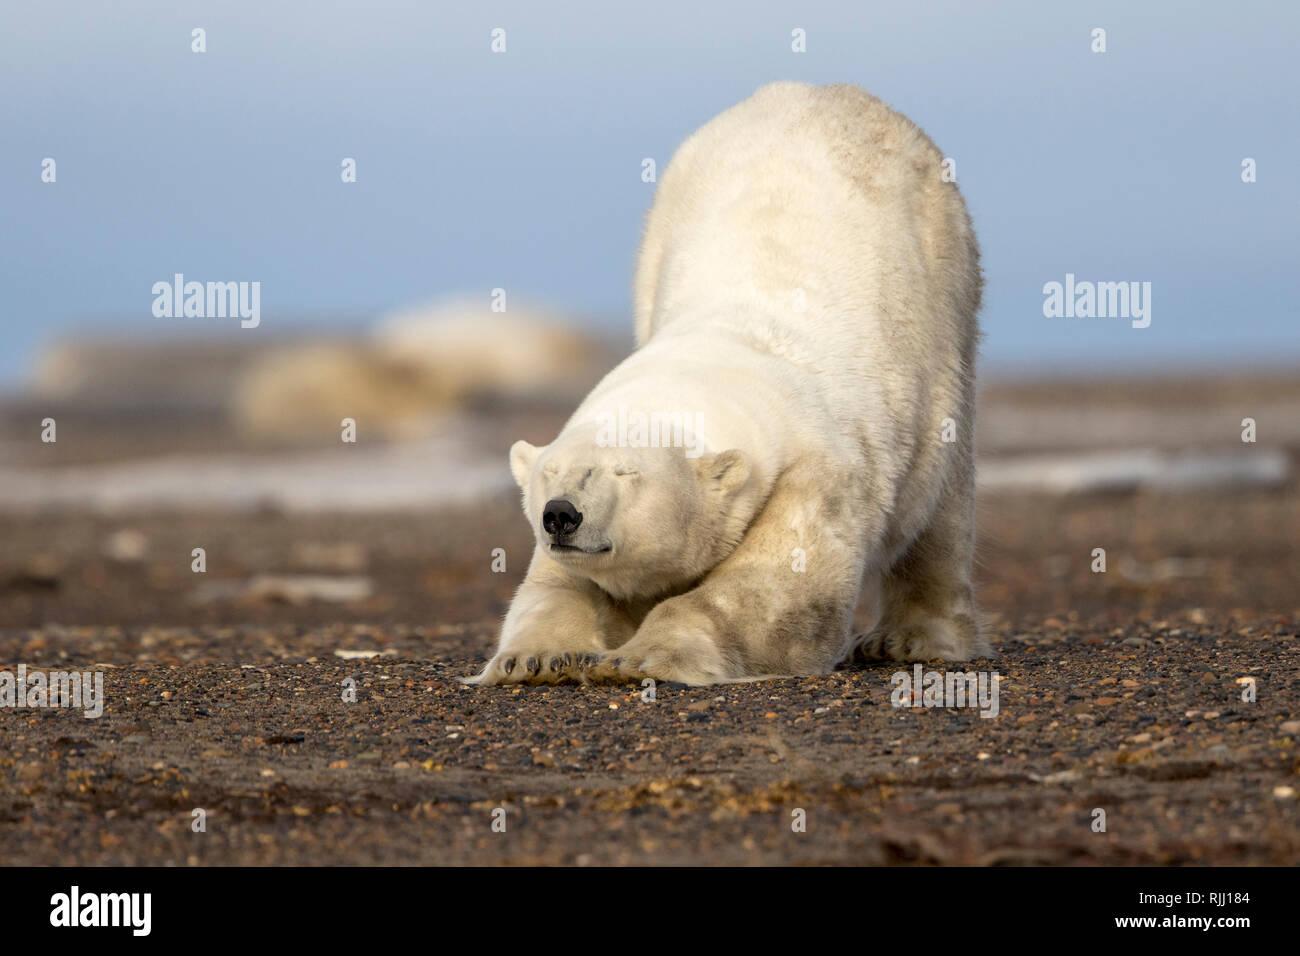 Polar Bear (Ursus maritimus, Thalarctos maritimus). stretching. Kaktovik, Alaska. - Stock Image